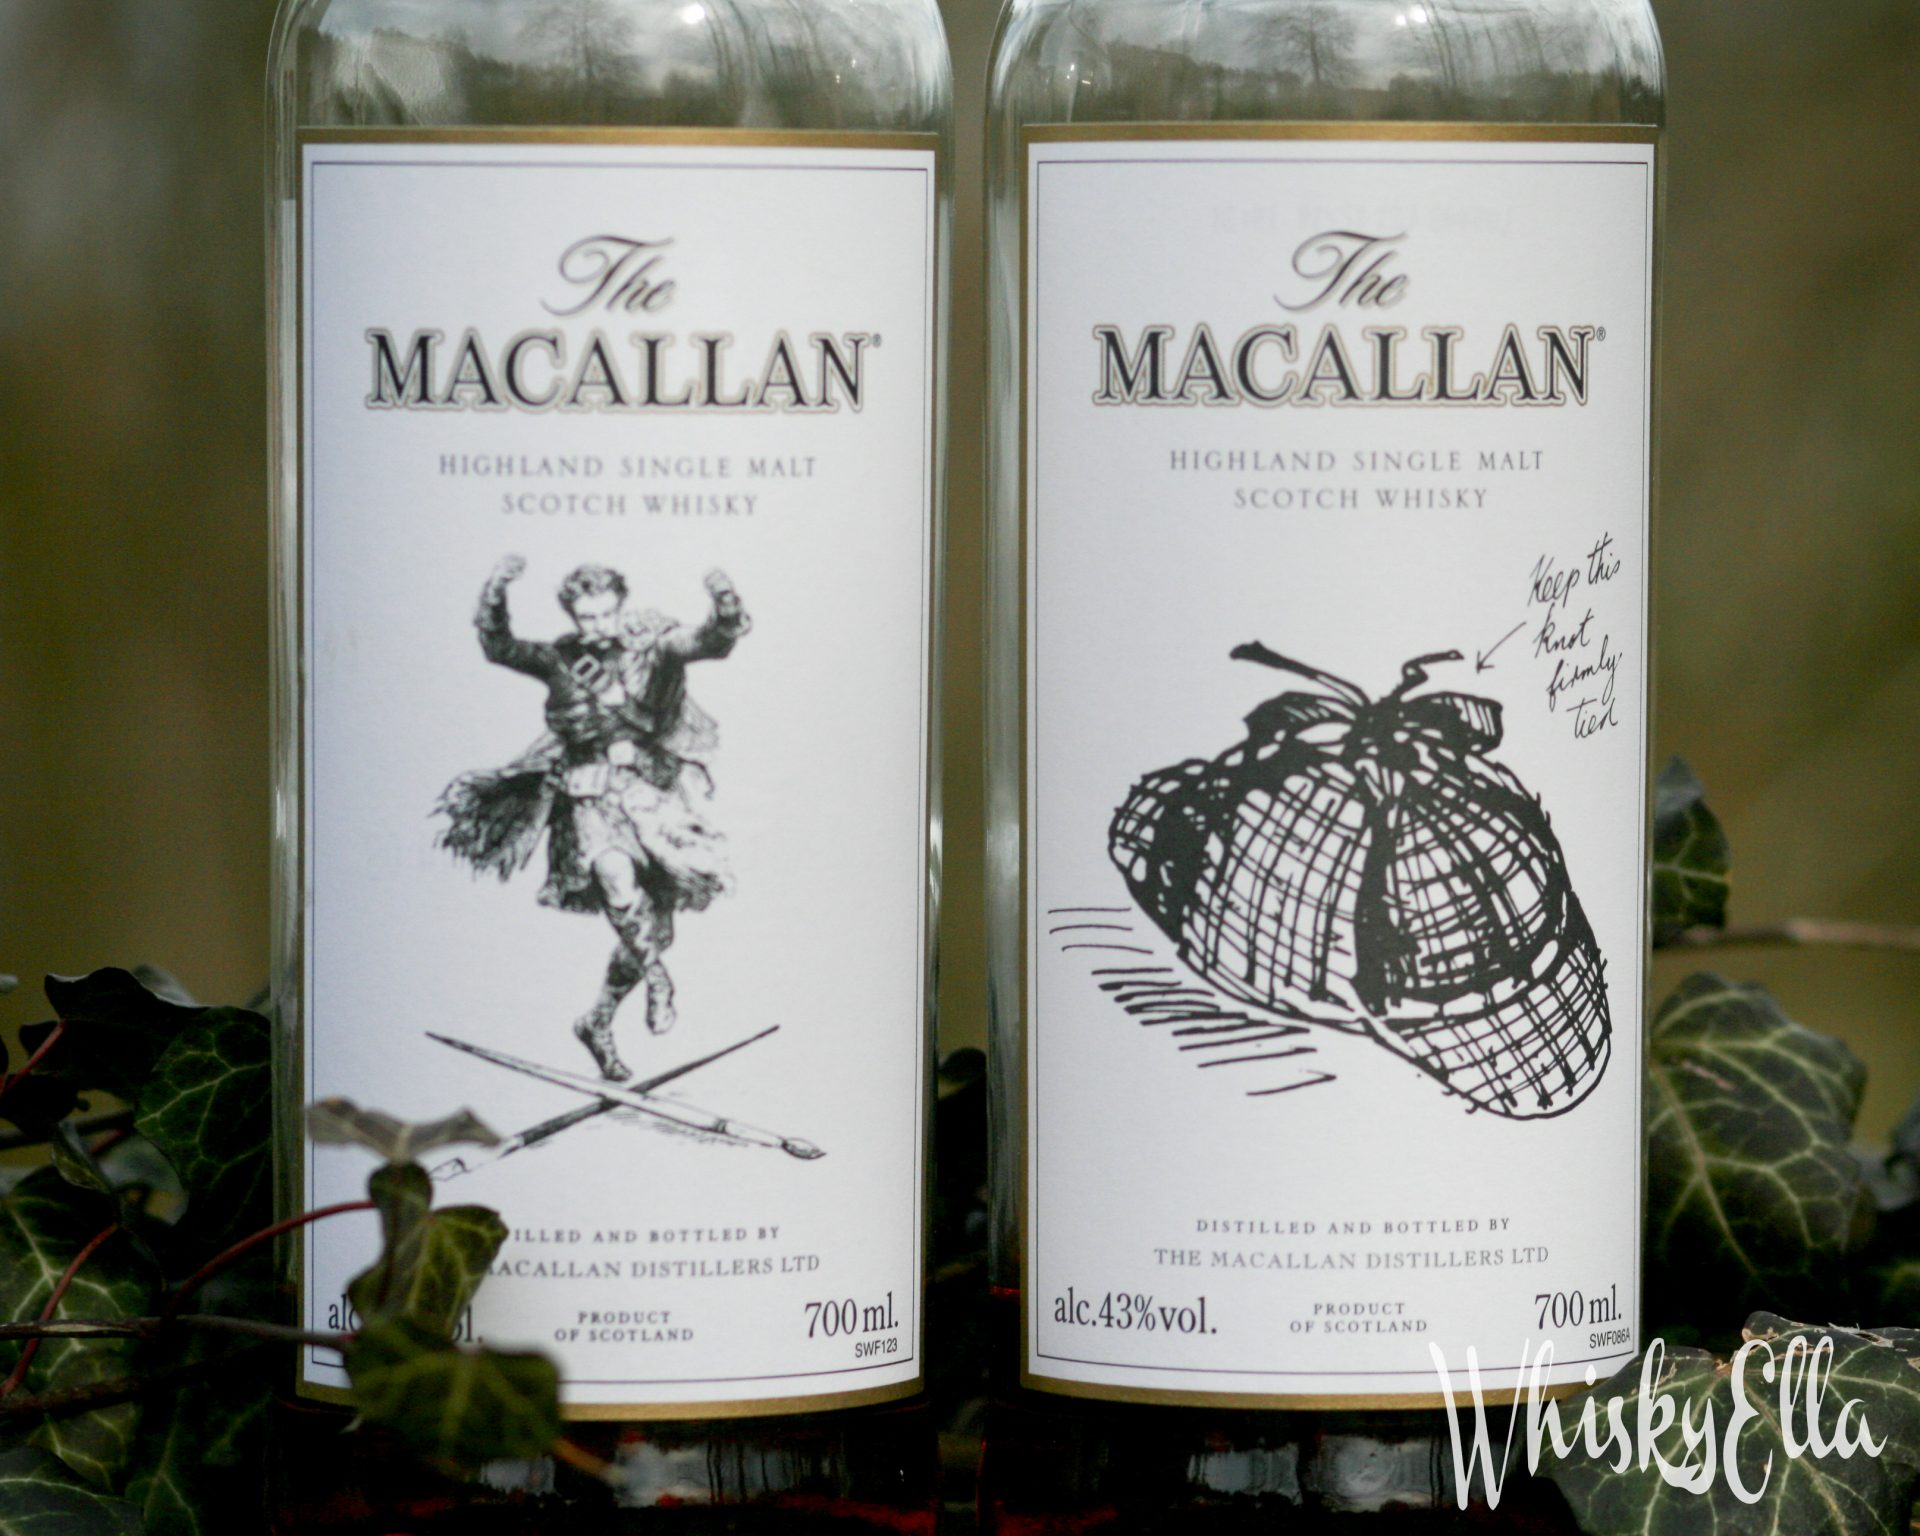 Nasza recenzja The Macallan Folio 5 & Folio 6 #102